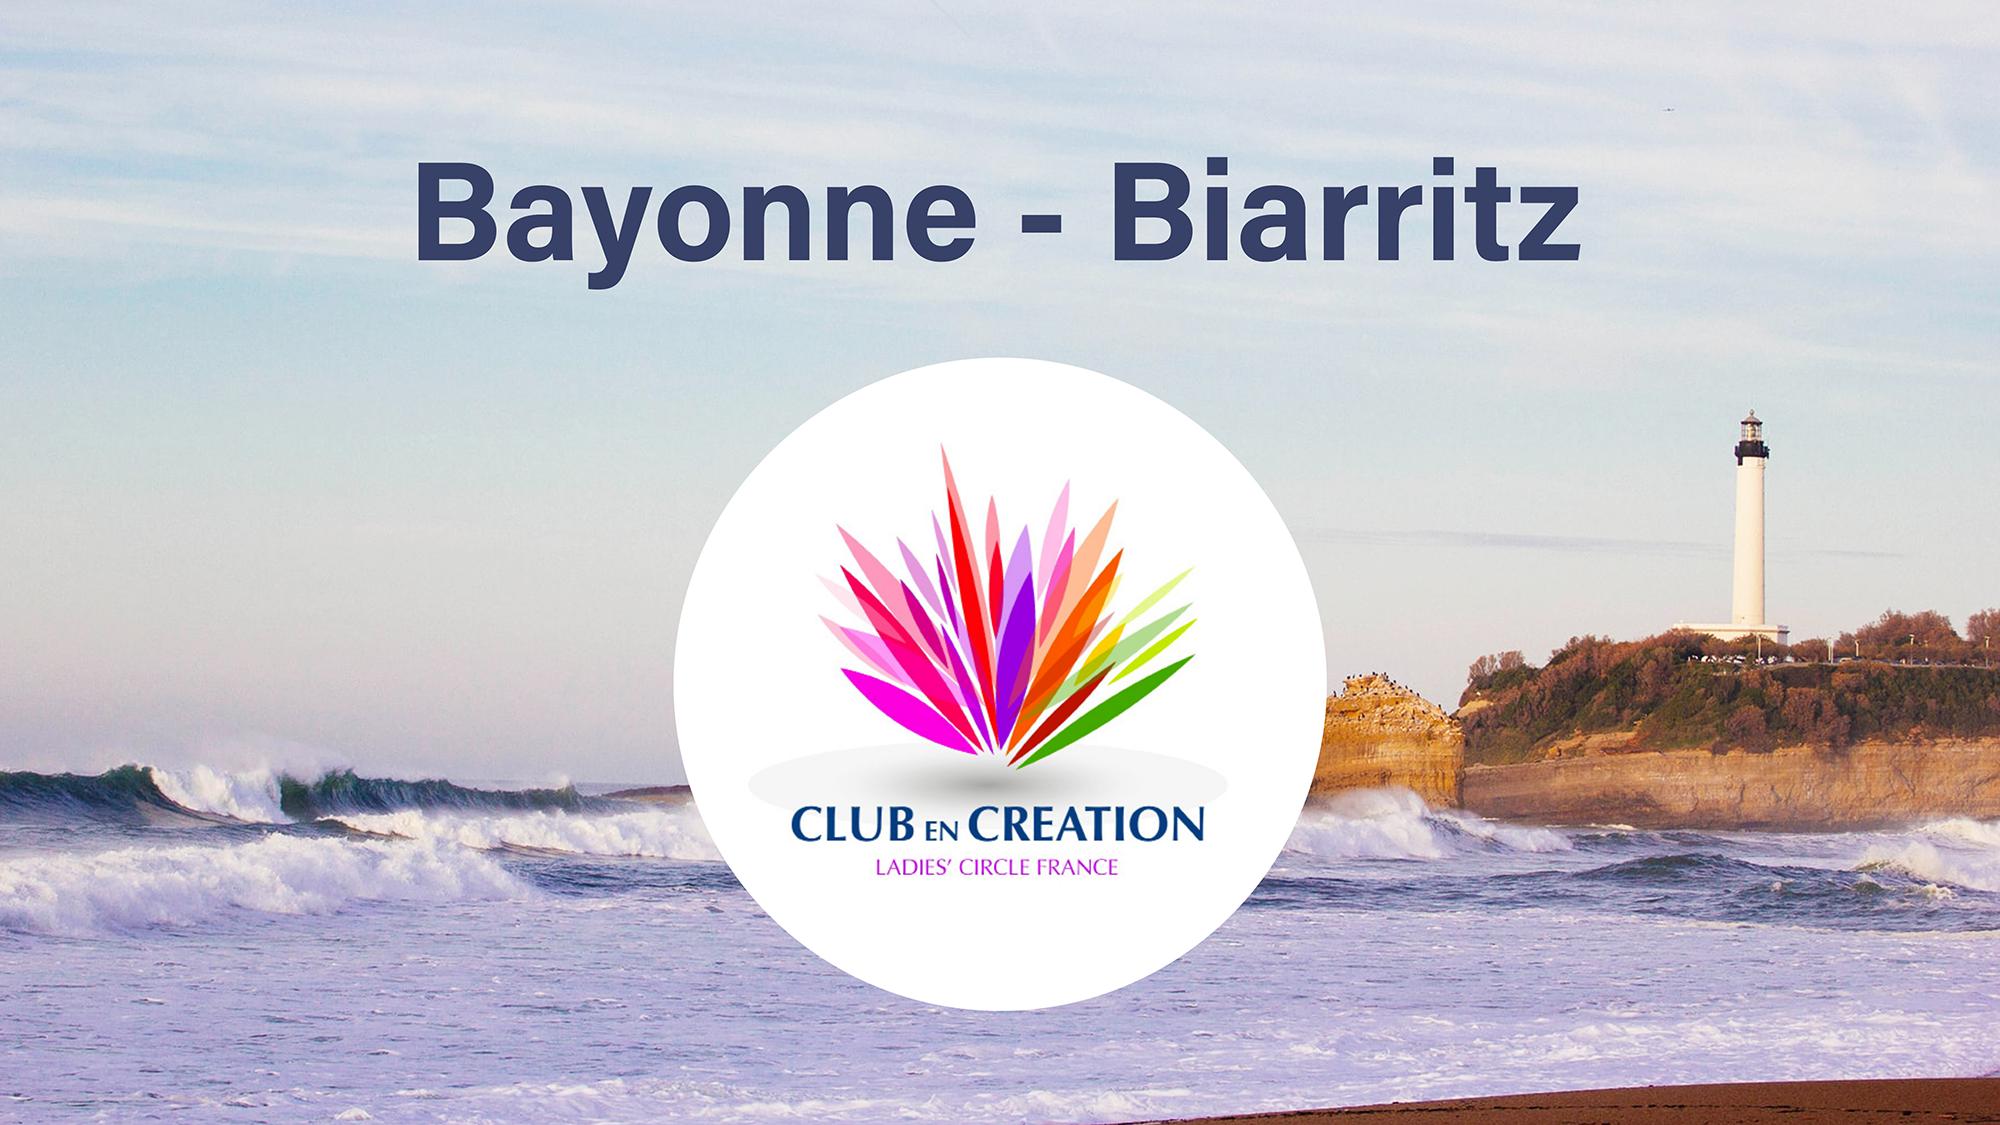 Bayonne-Biarritz : Un club en création